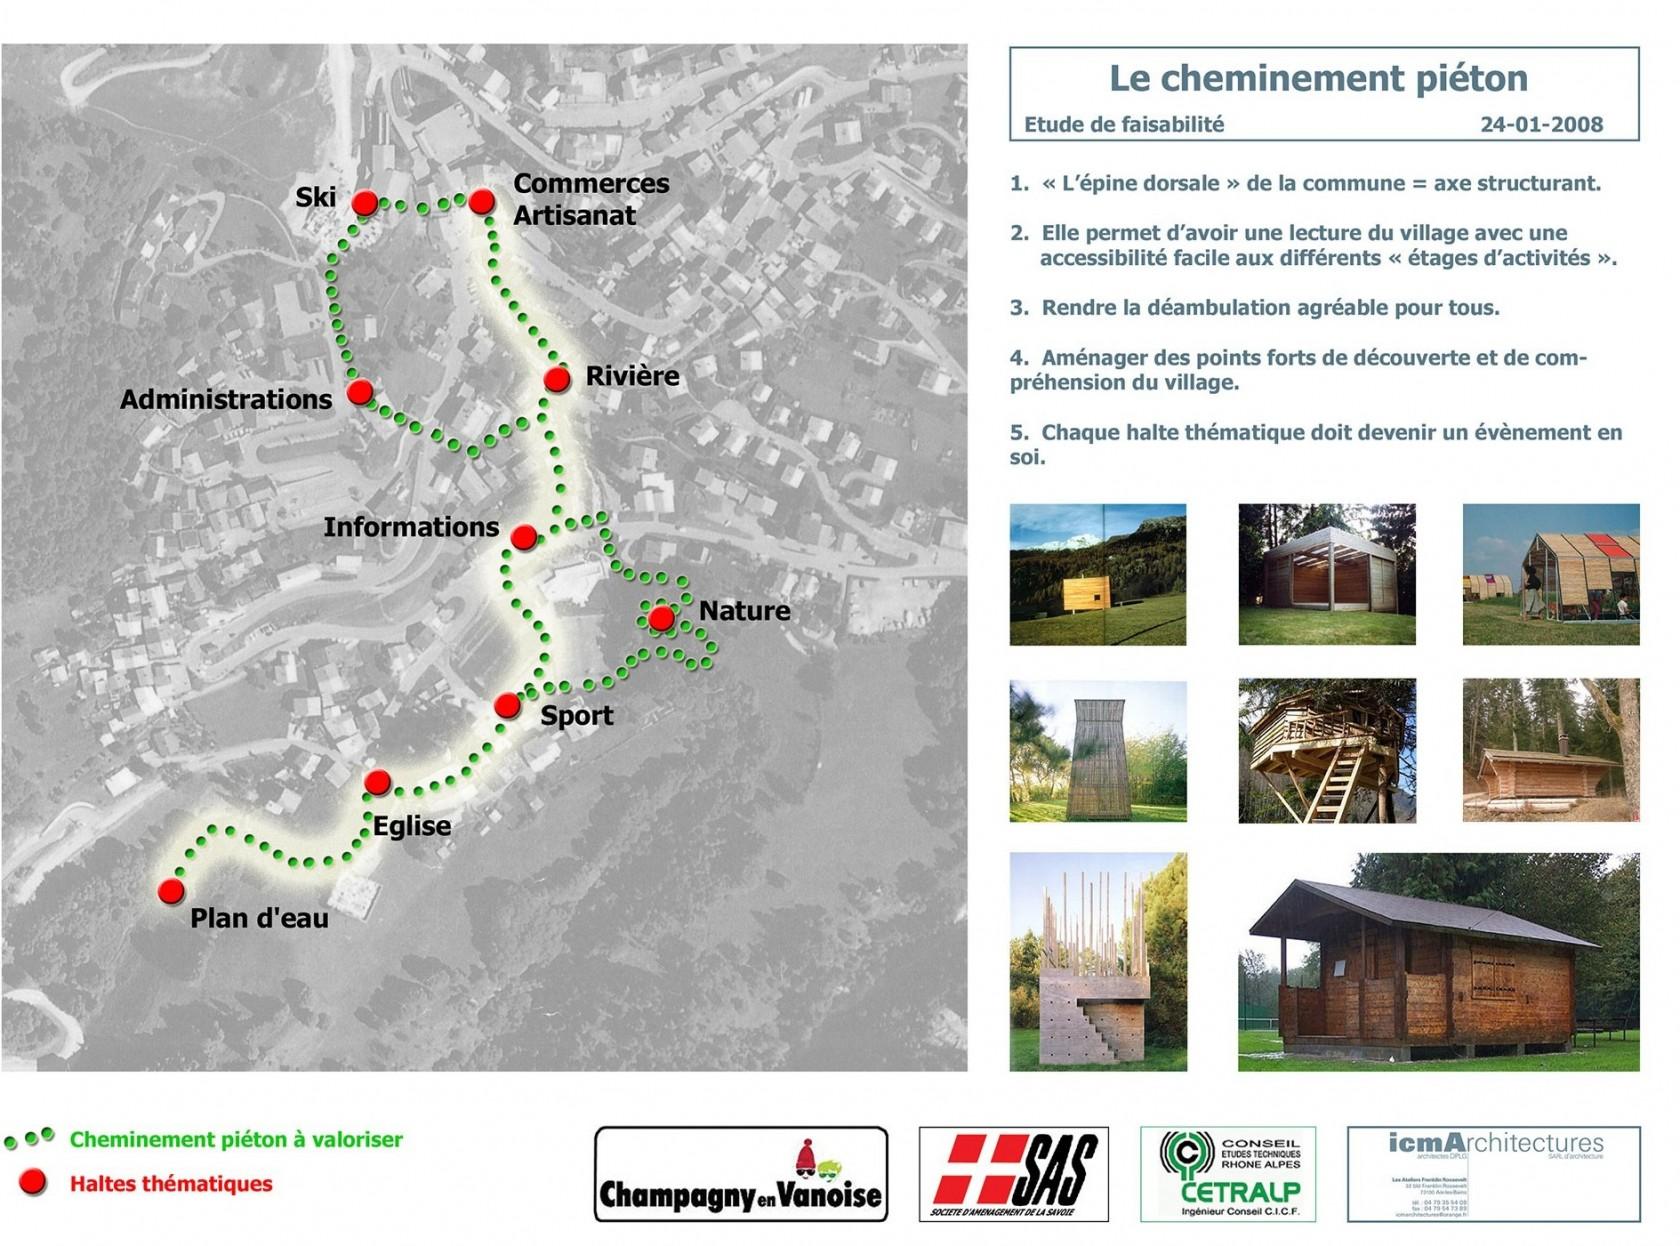 0710-20-Cheminement-pieton-e14480343482111